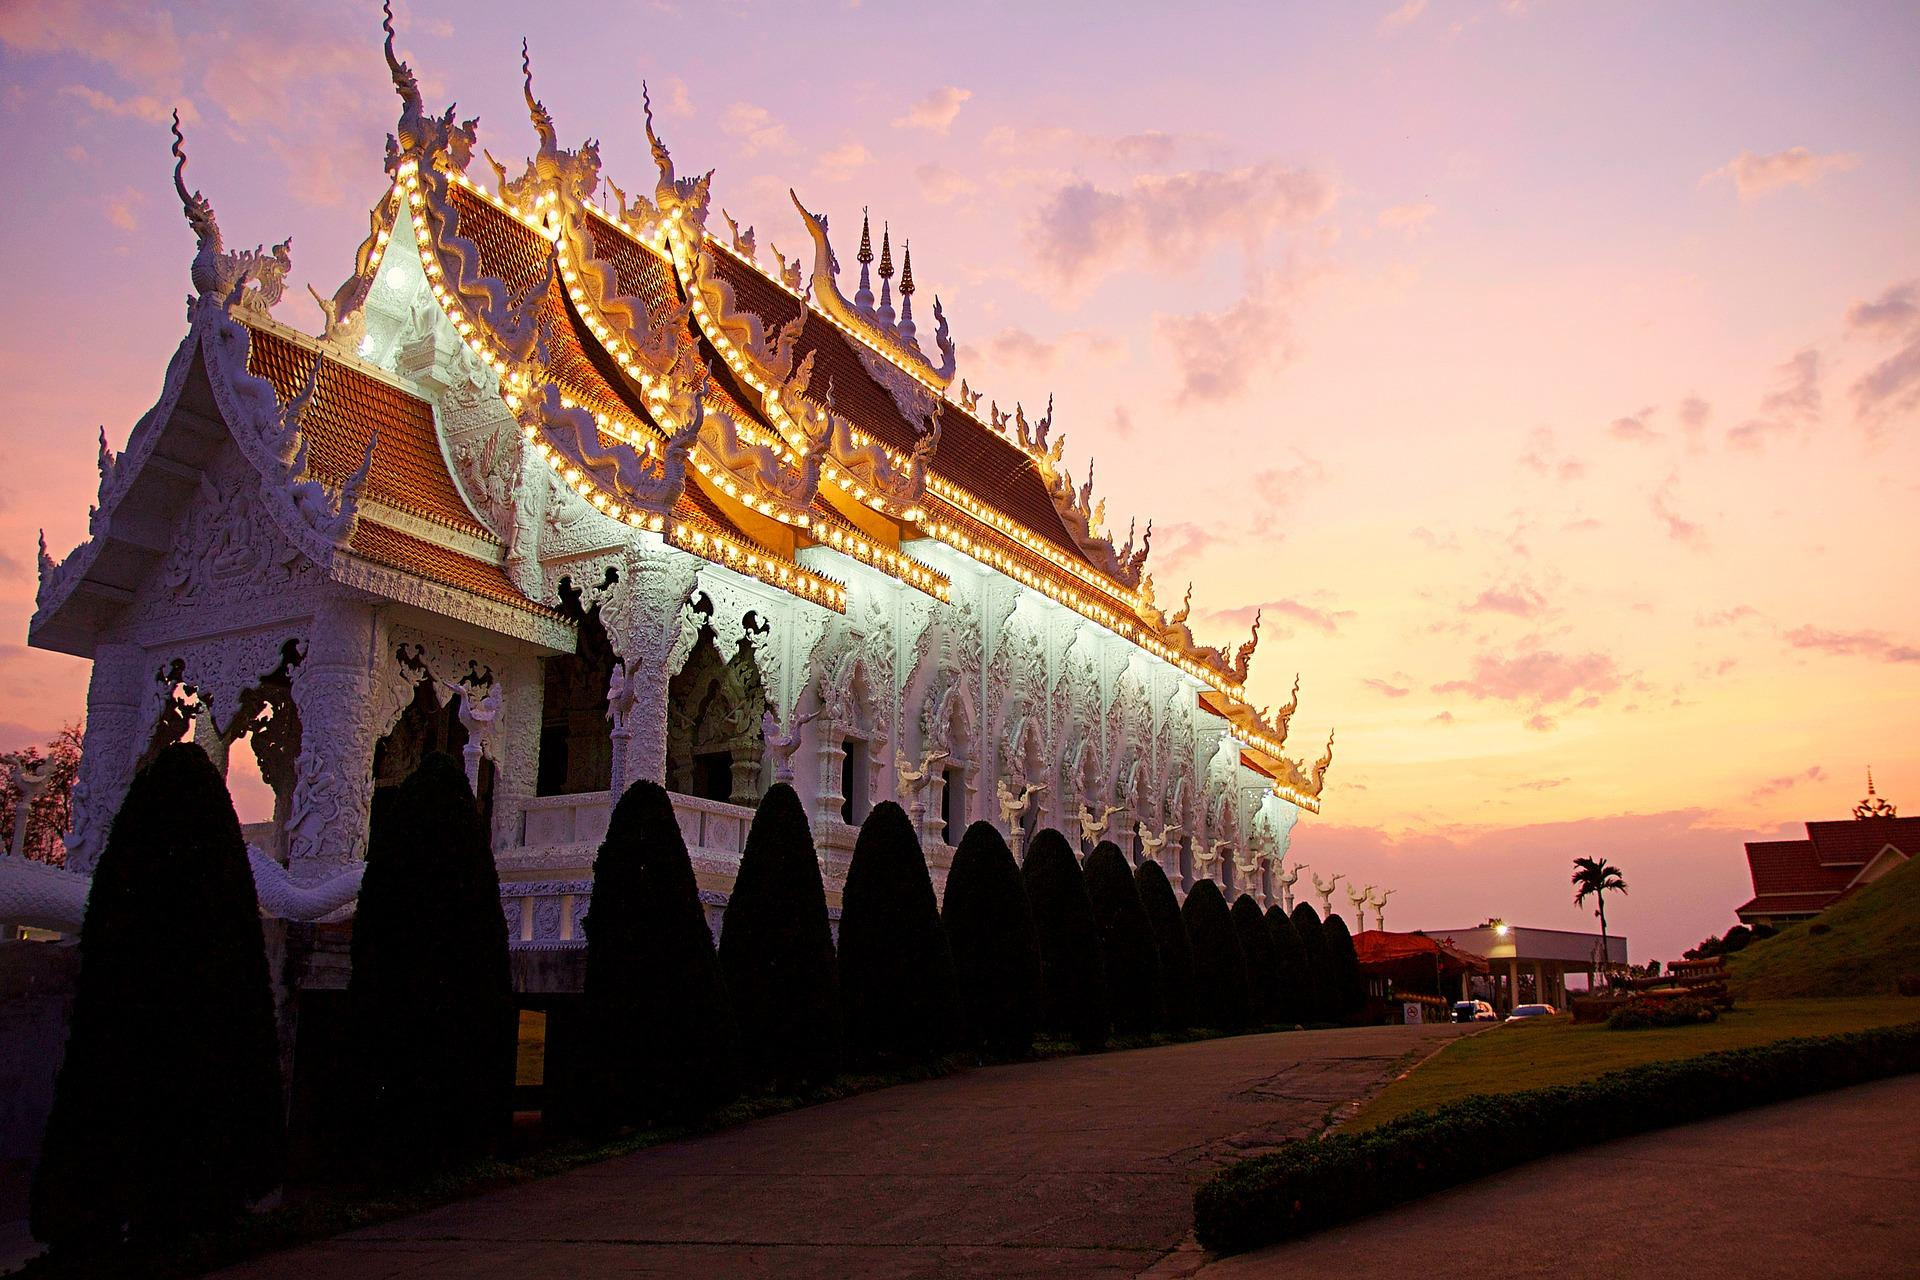 /optitravel/online/www/layout22/single_product.php?pkt_id=147&Produto=Bangkok, Maravilhas do Norte (Privado) & Krabi&destino=TAILÂNDIA